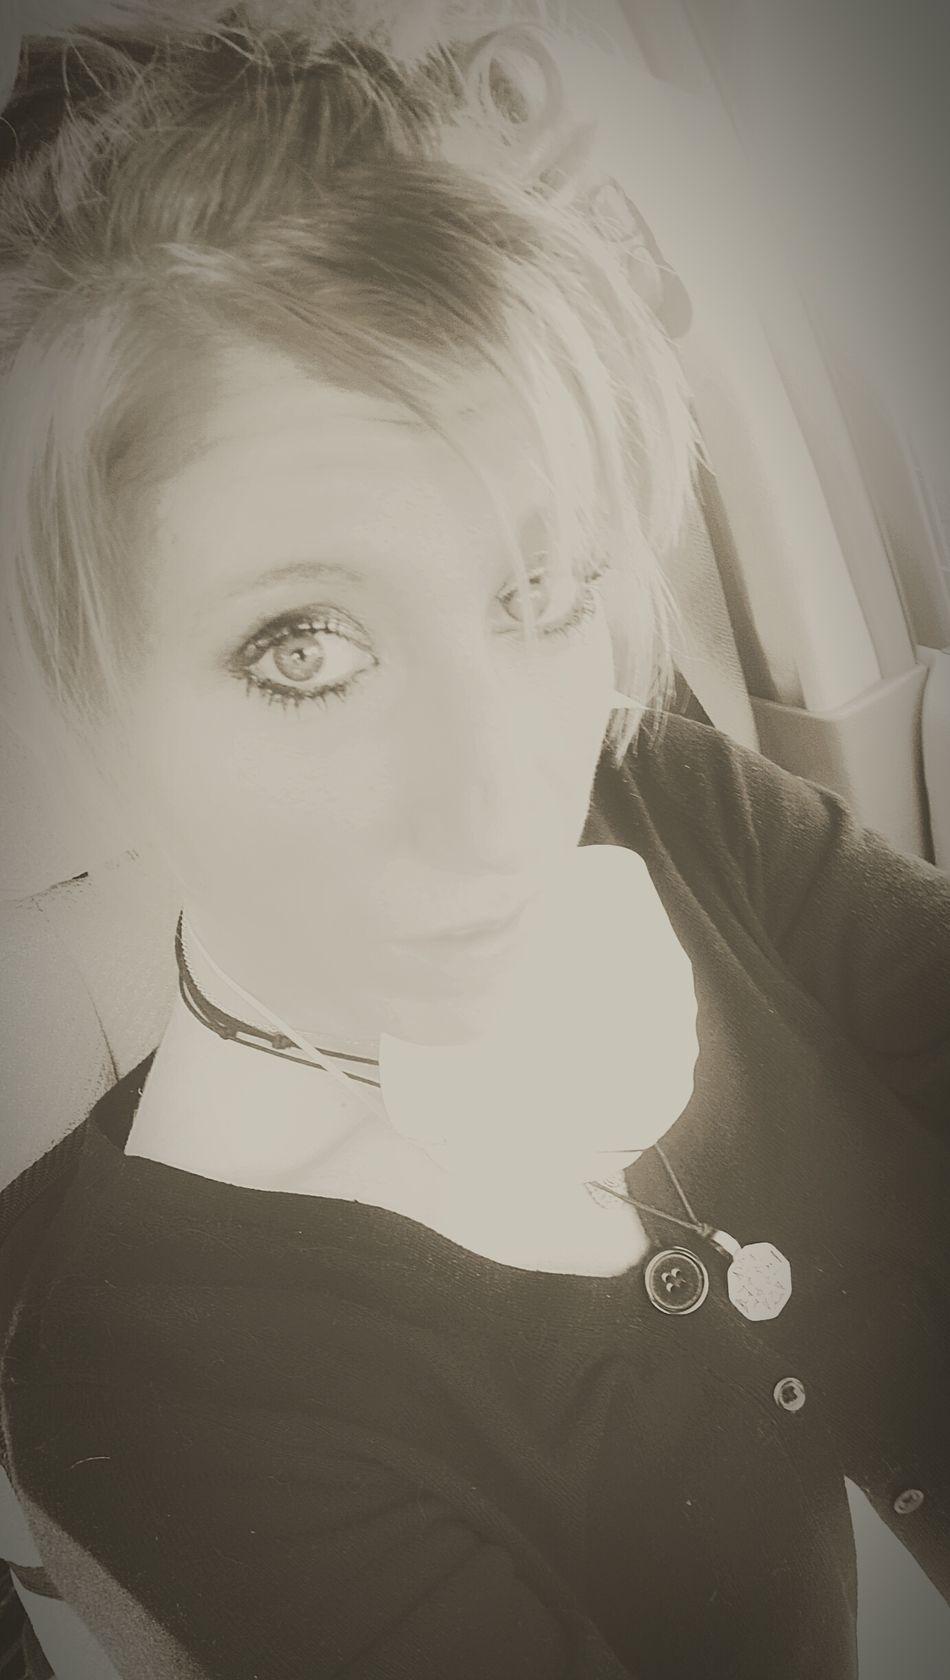 Back for 2nd app today... 😷👅 Everyday Is A New Day, Be Grateful WelcometomyWorld ❤💜 Averagedayatmydocs! Kaiser SurvivingisFighting EyeEm BlackandWhite B&W Portrait Myhomeawayfromhome